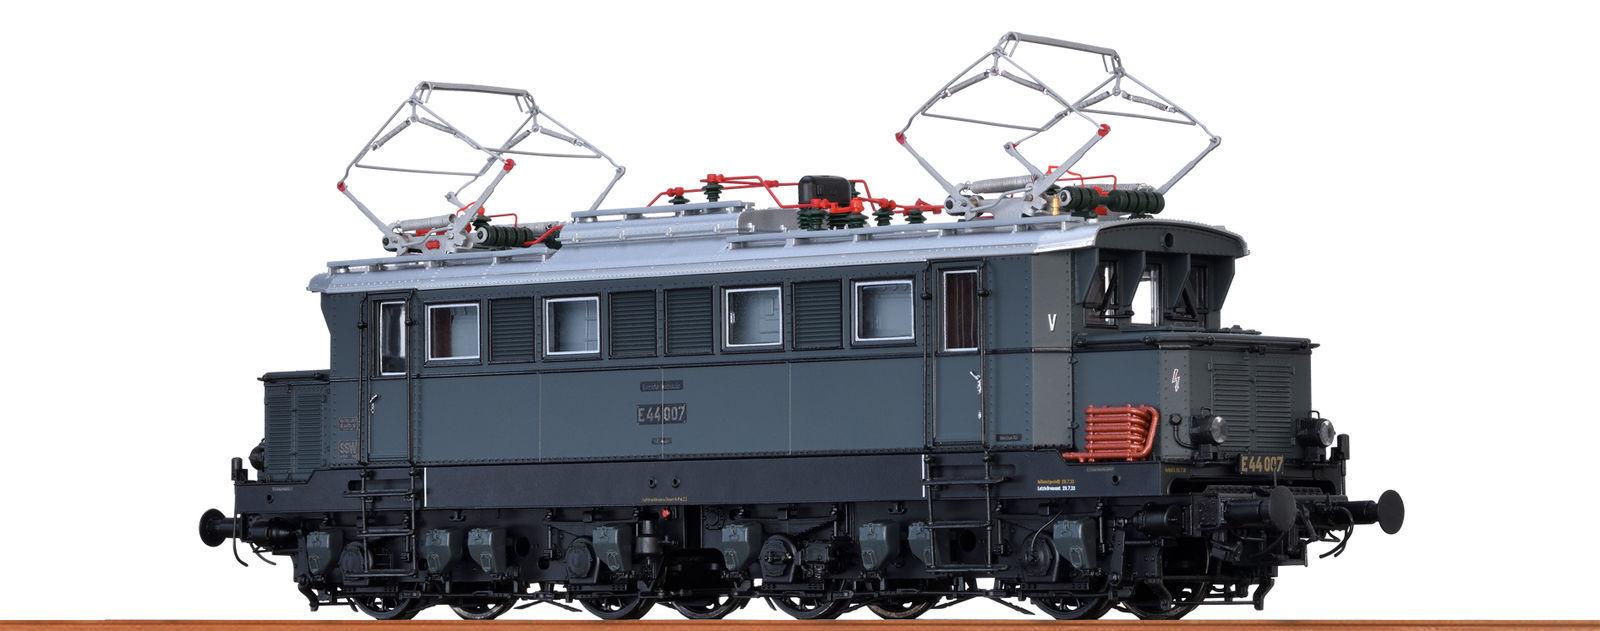 Brawa 43400 Locomotiva Elettrica E44 007 DRG Ep.ii Ho Basi + Nuovo